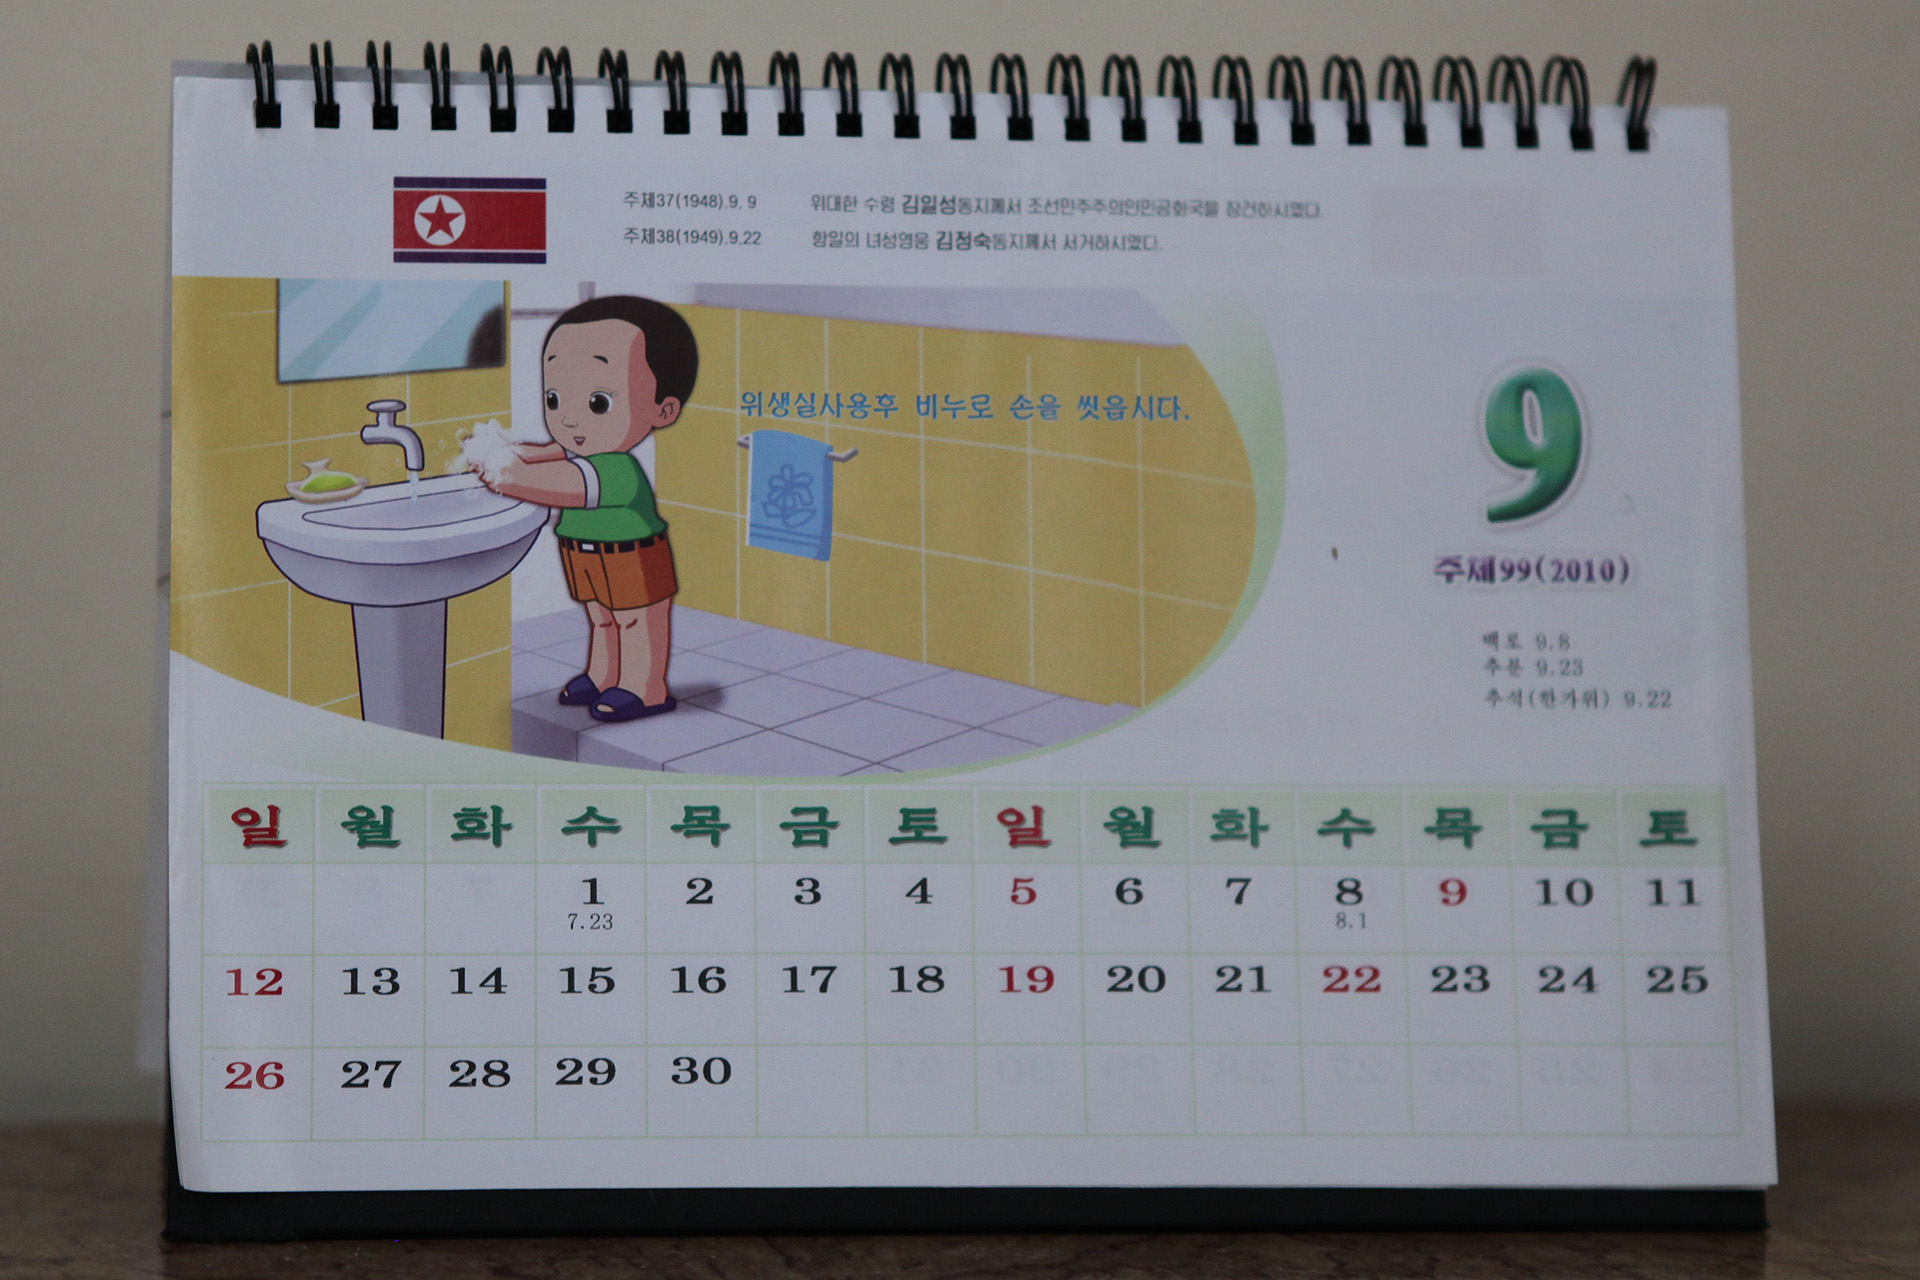 Indonesia pdf 2014 kalender